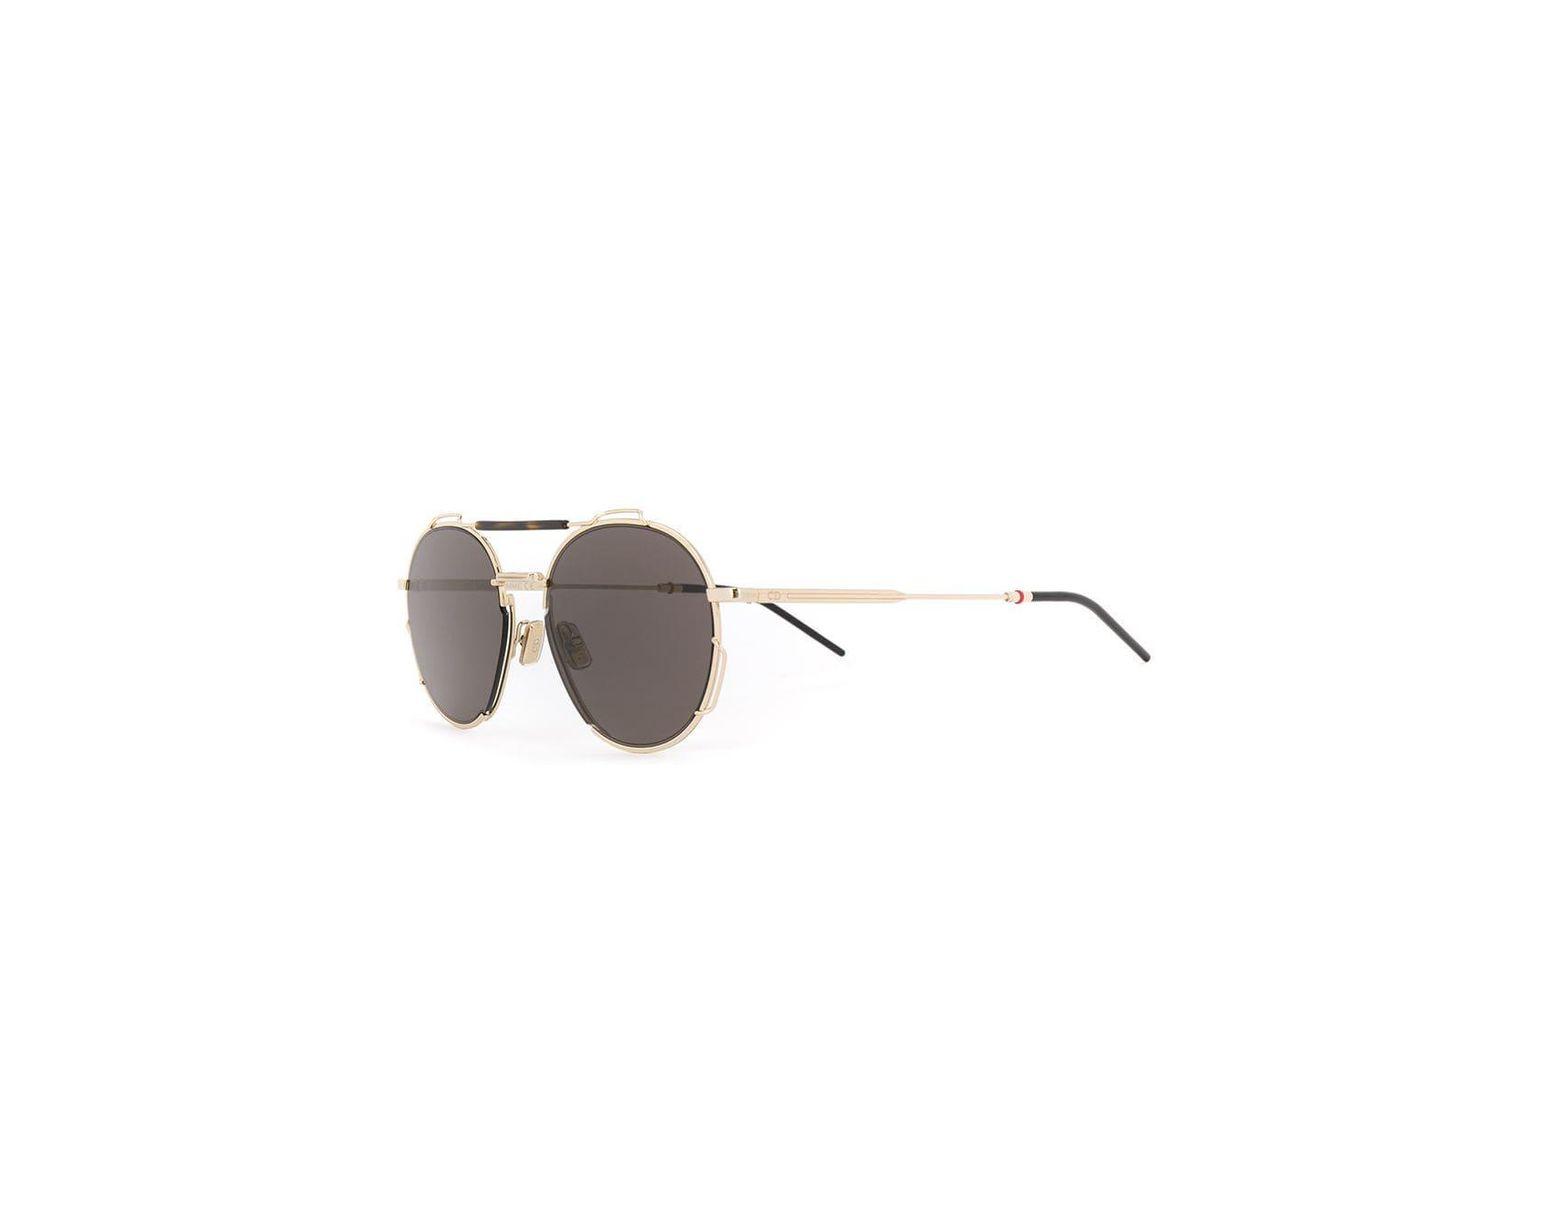 135d9fc76f3f Lyst - Dior Dior0234s Sunglasses in Black